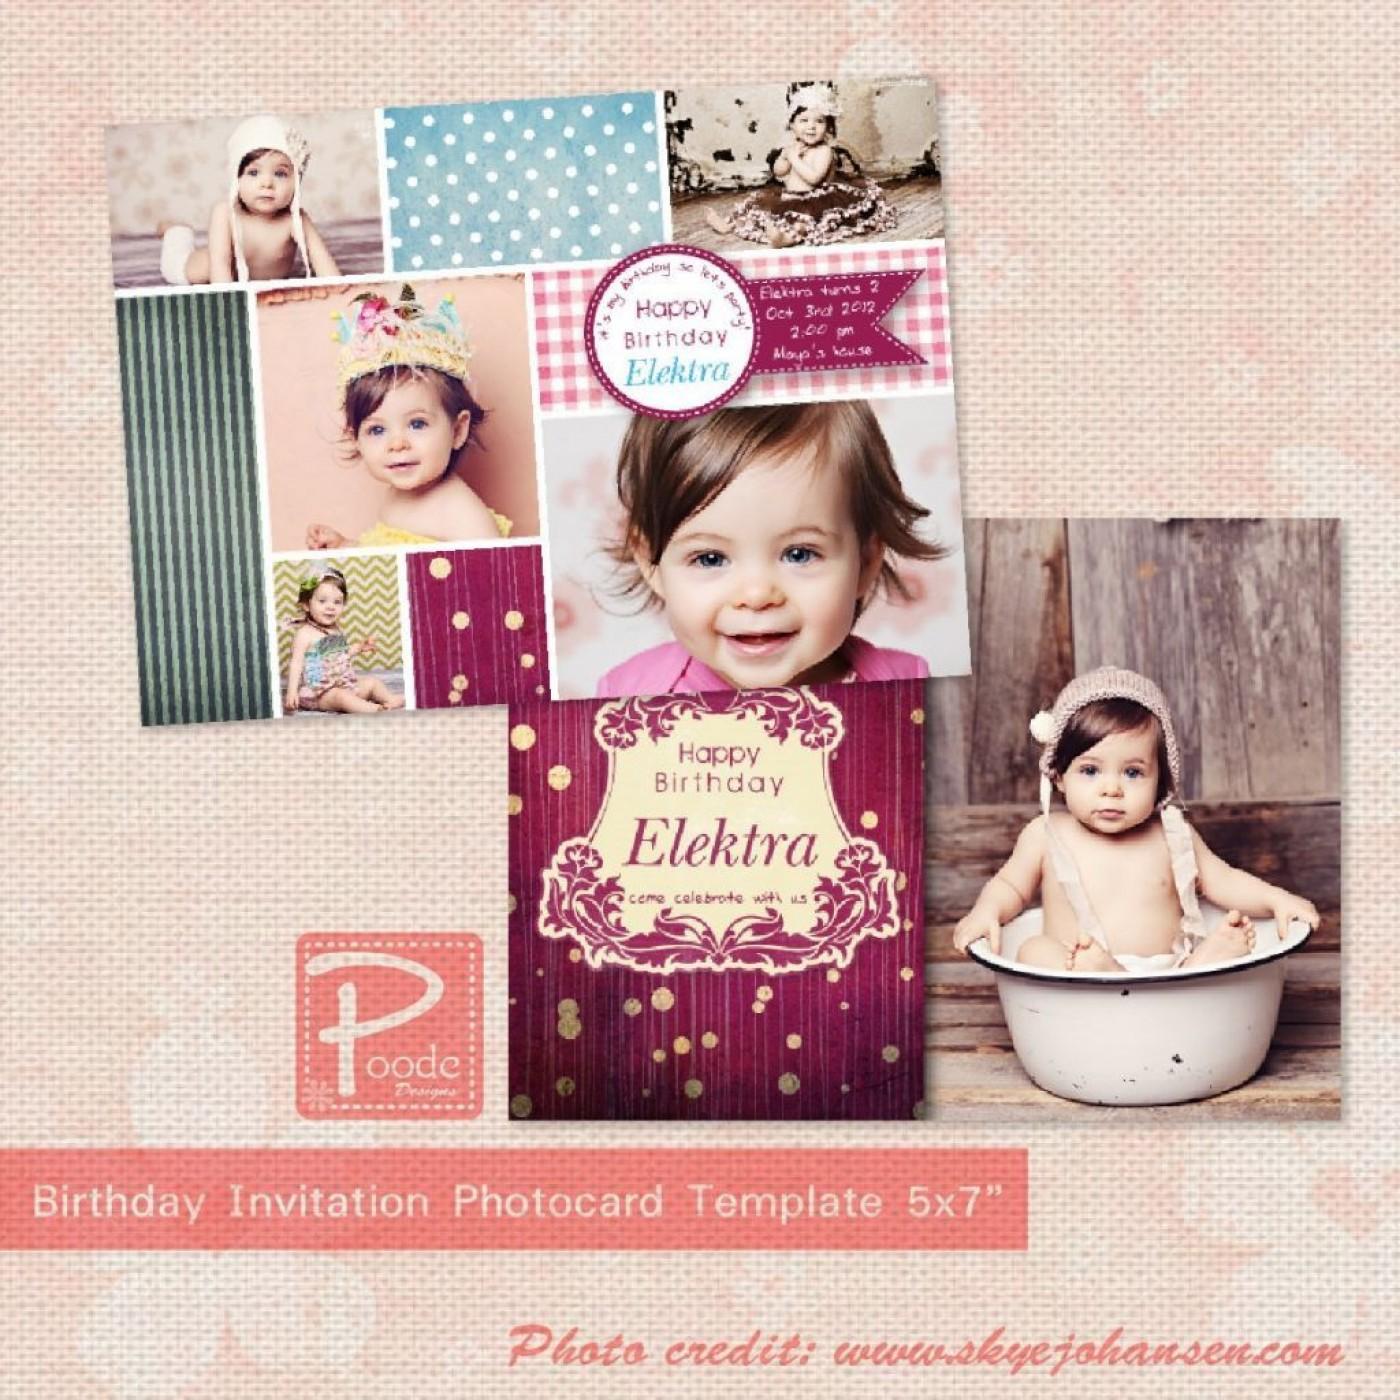 002 Phenomenal Free Online 1st Birthday Invitation Card Maker For Twin Inspiration 1400